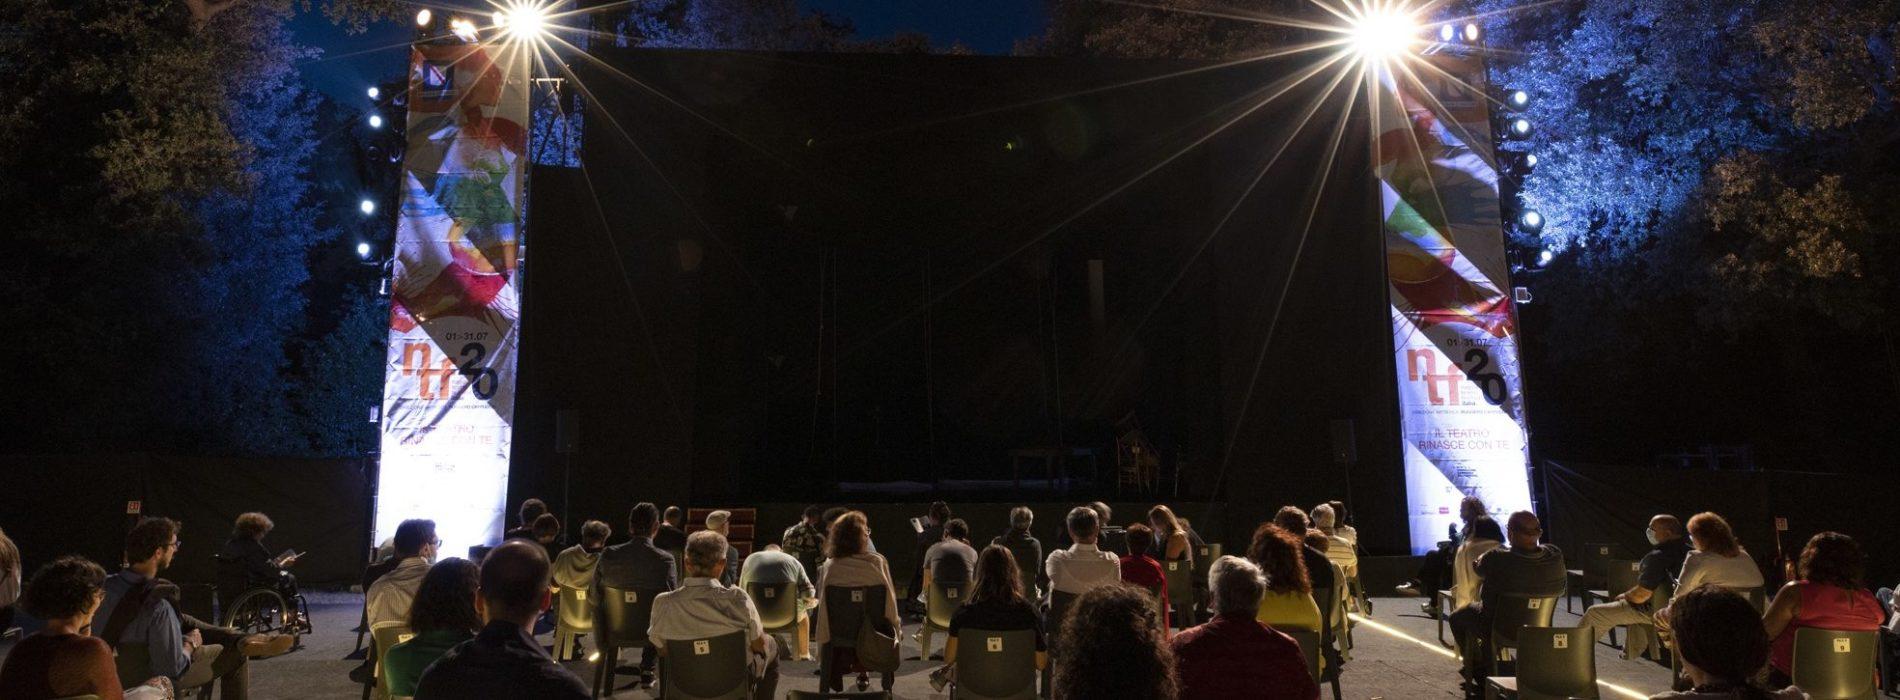 Napoli Teatro Festival Italia. Sfida vinta! Diecimila spettatori